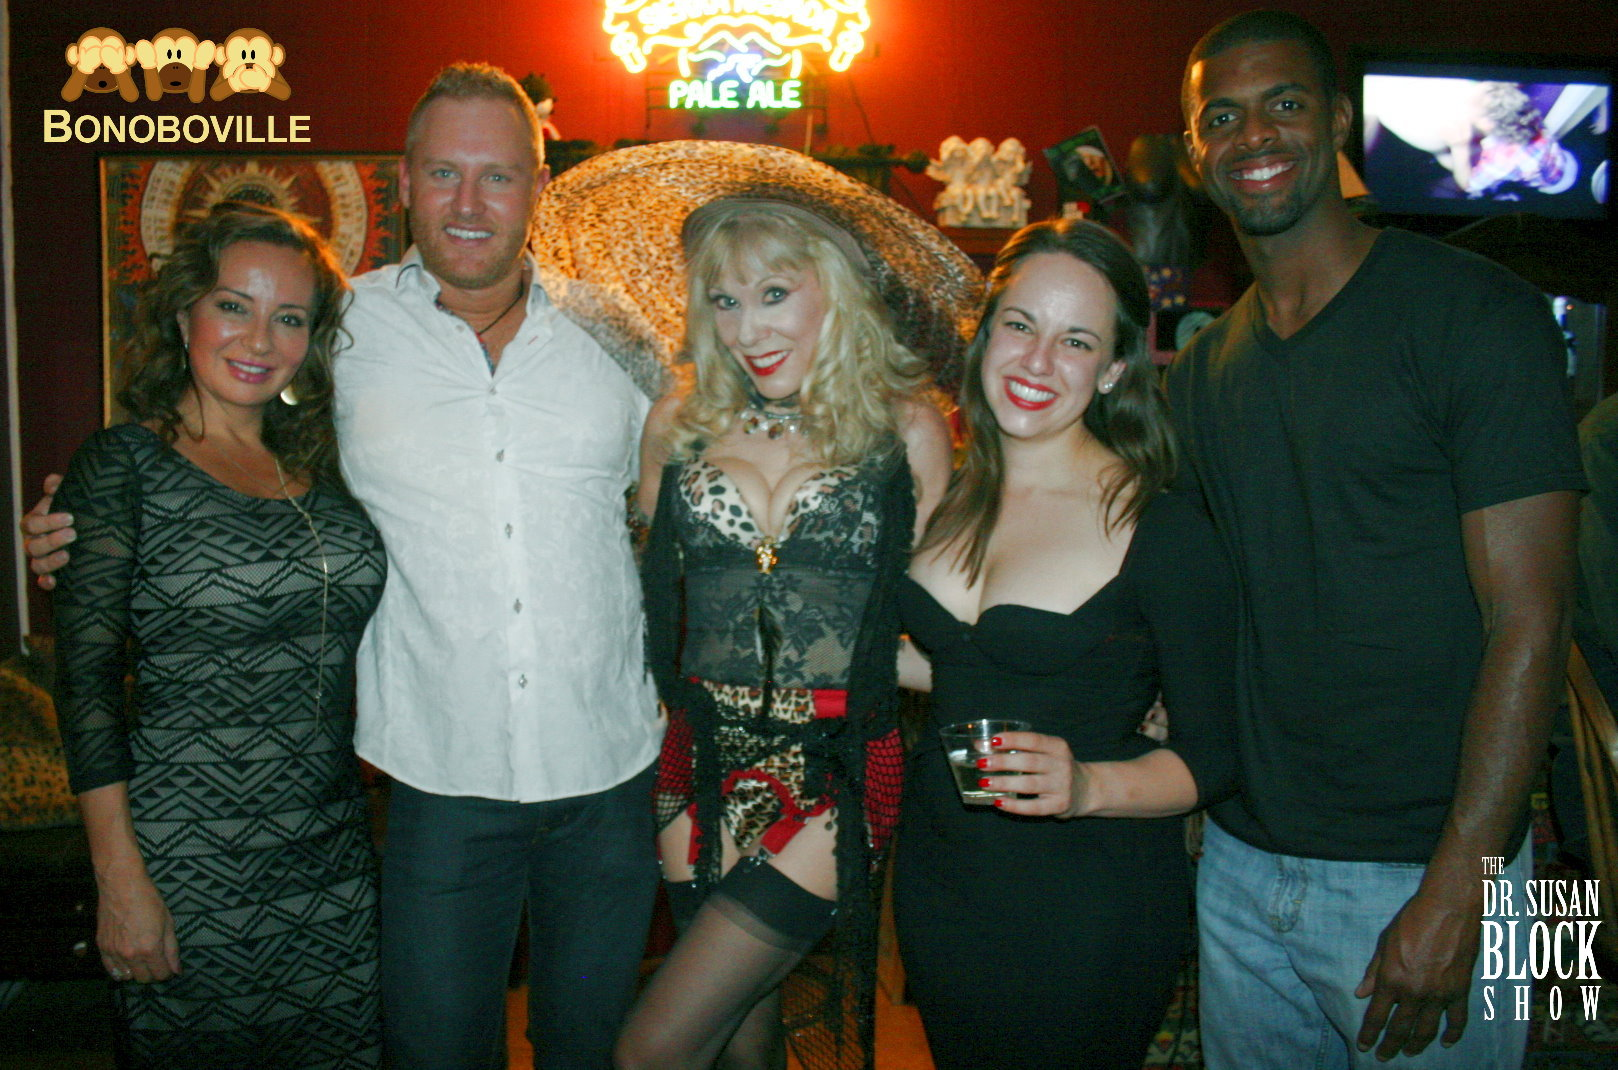 SAR at the Bonoboville Bar. Photo: L'Erotique